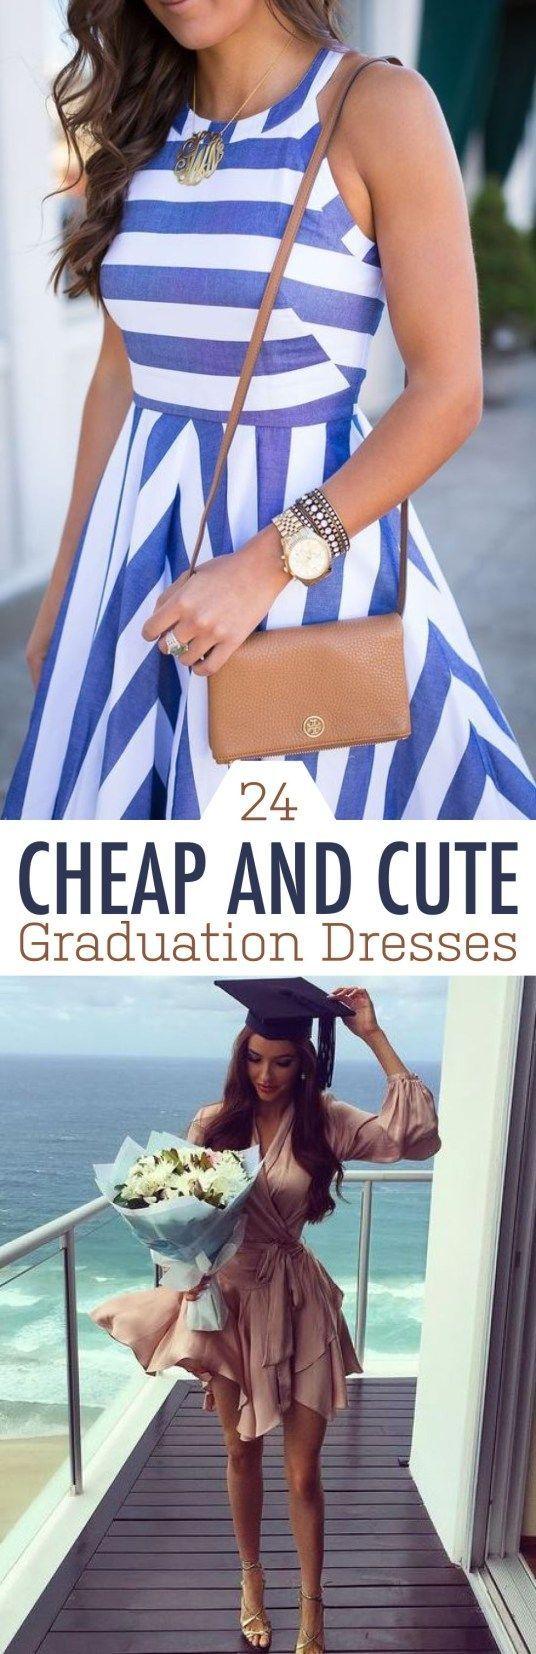 24 Cheap And Cute Graduation Dresses #graduationdresscollege